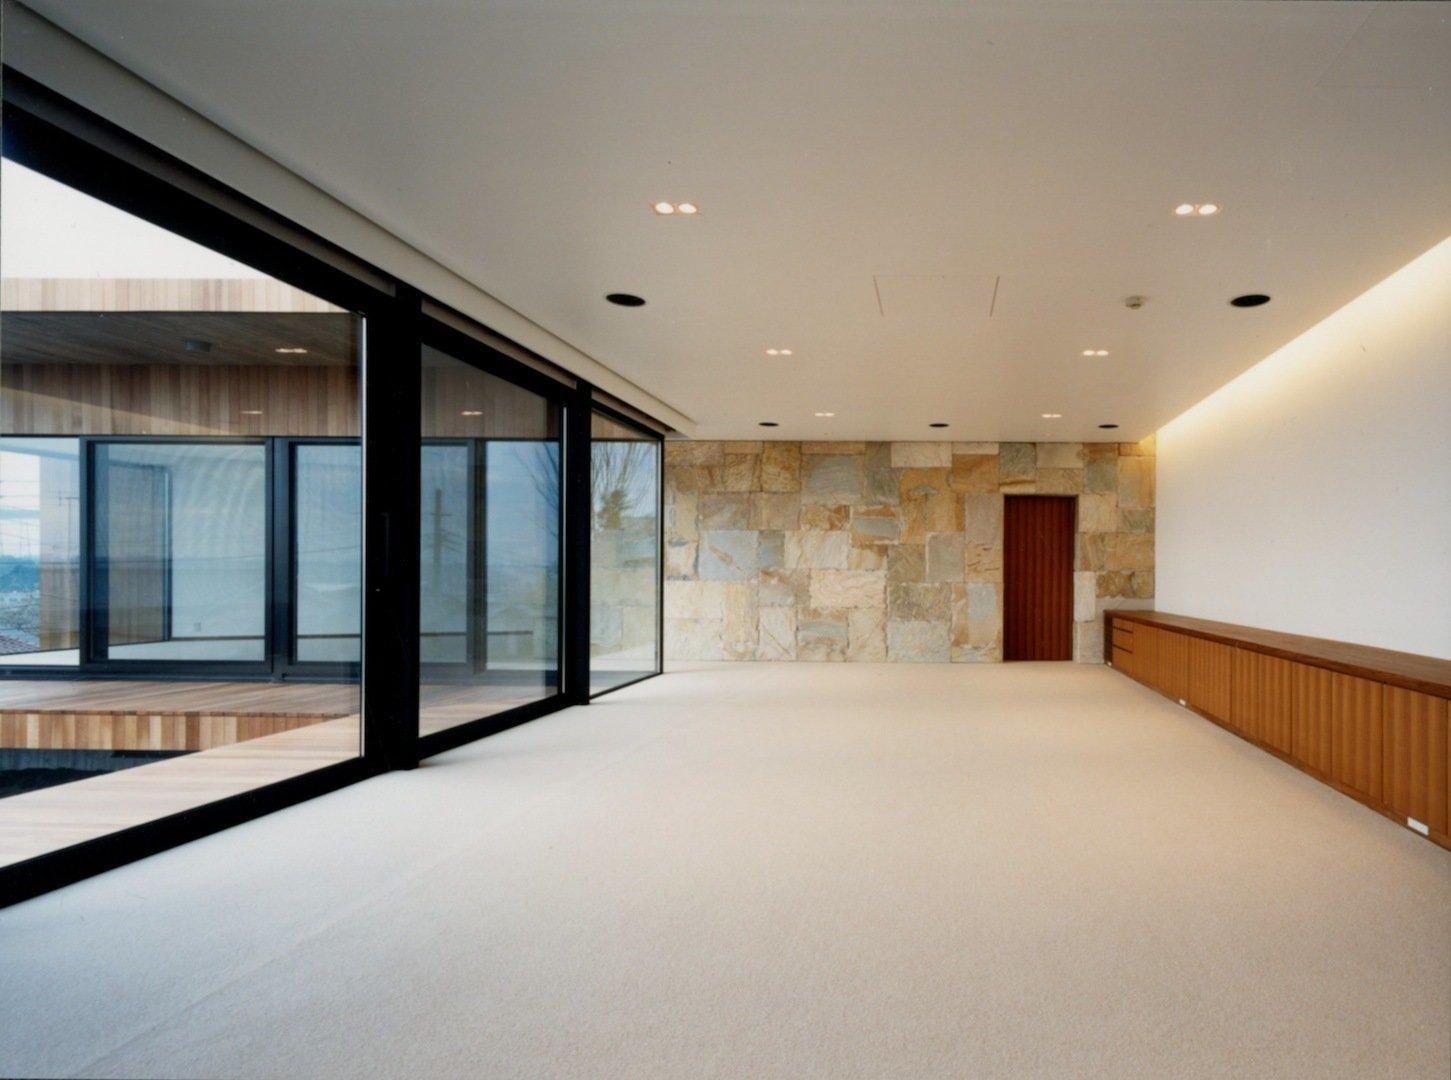 House in Okamoto by Nobuo Araki / The Archetype